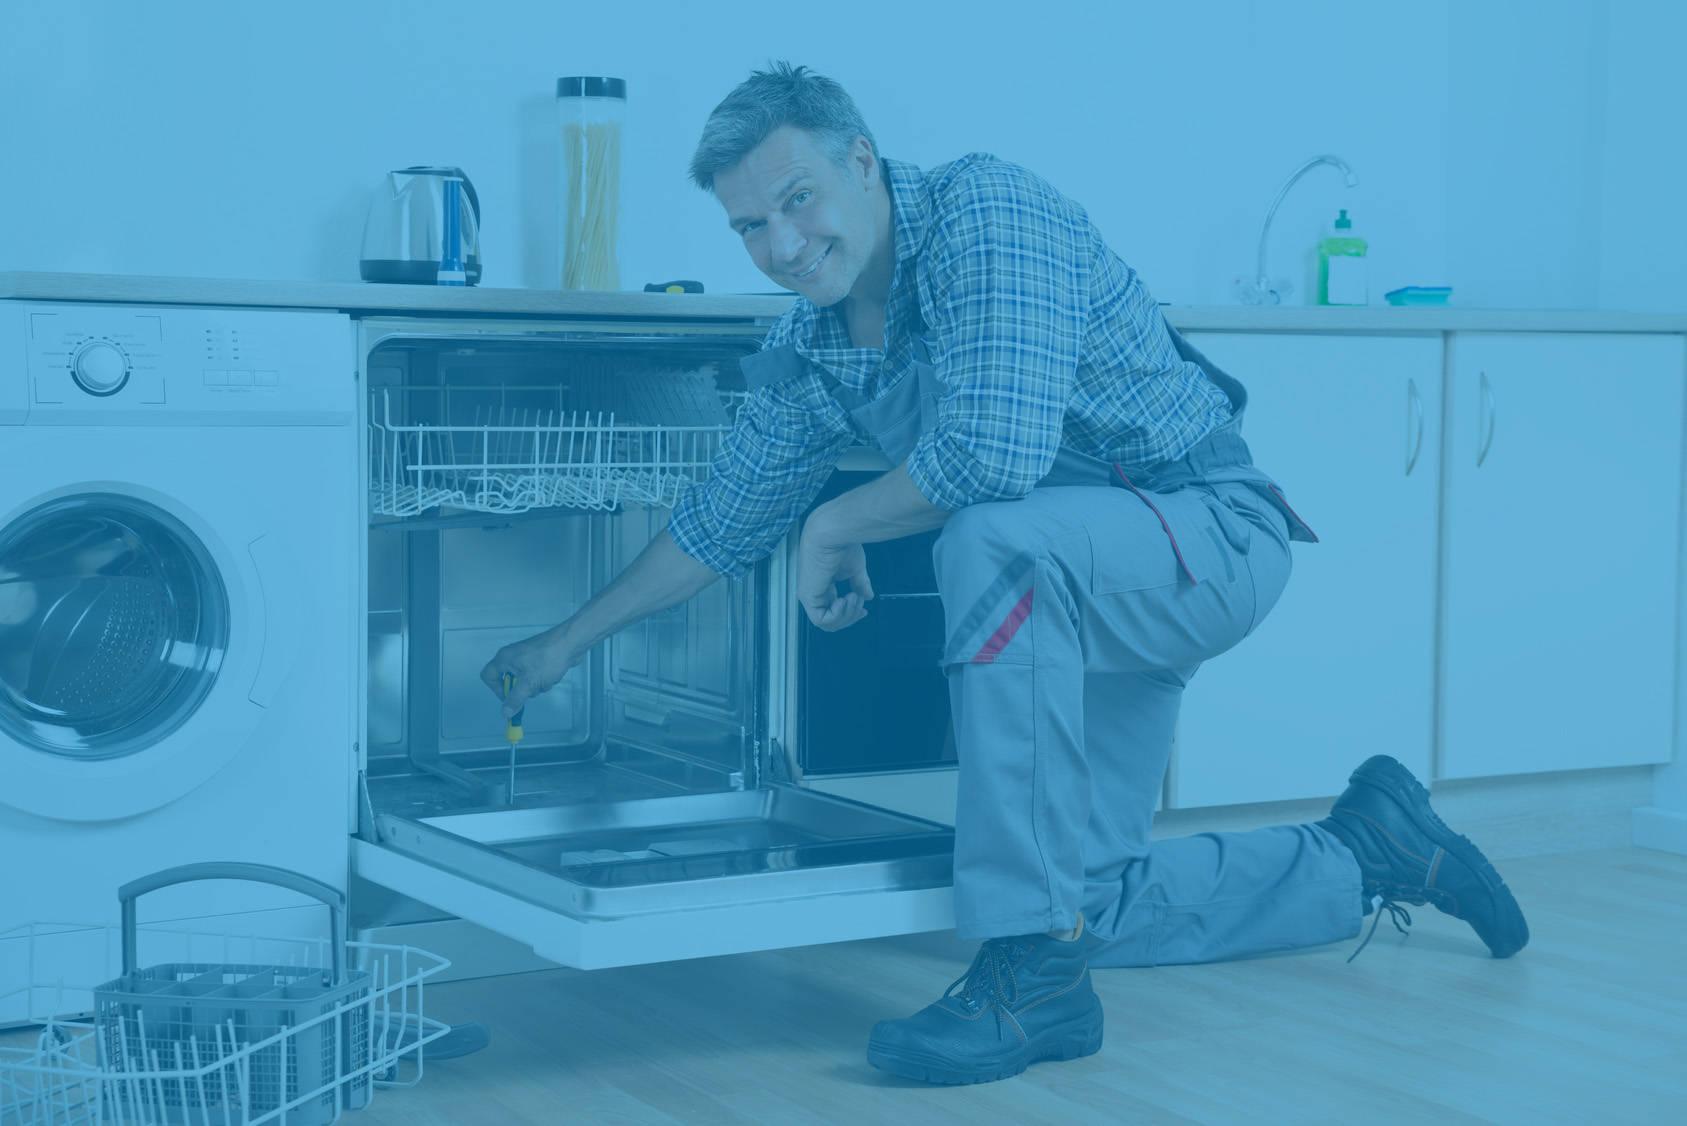 Técnicos de lavadoras, neveras, secadoras, lavavajillas, calentadores, hornos